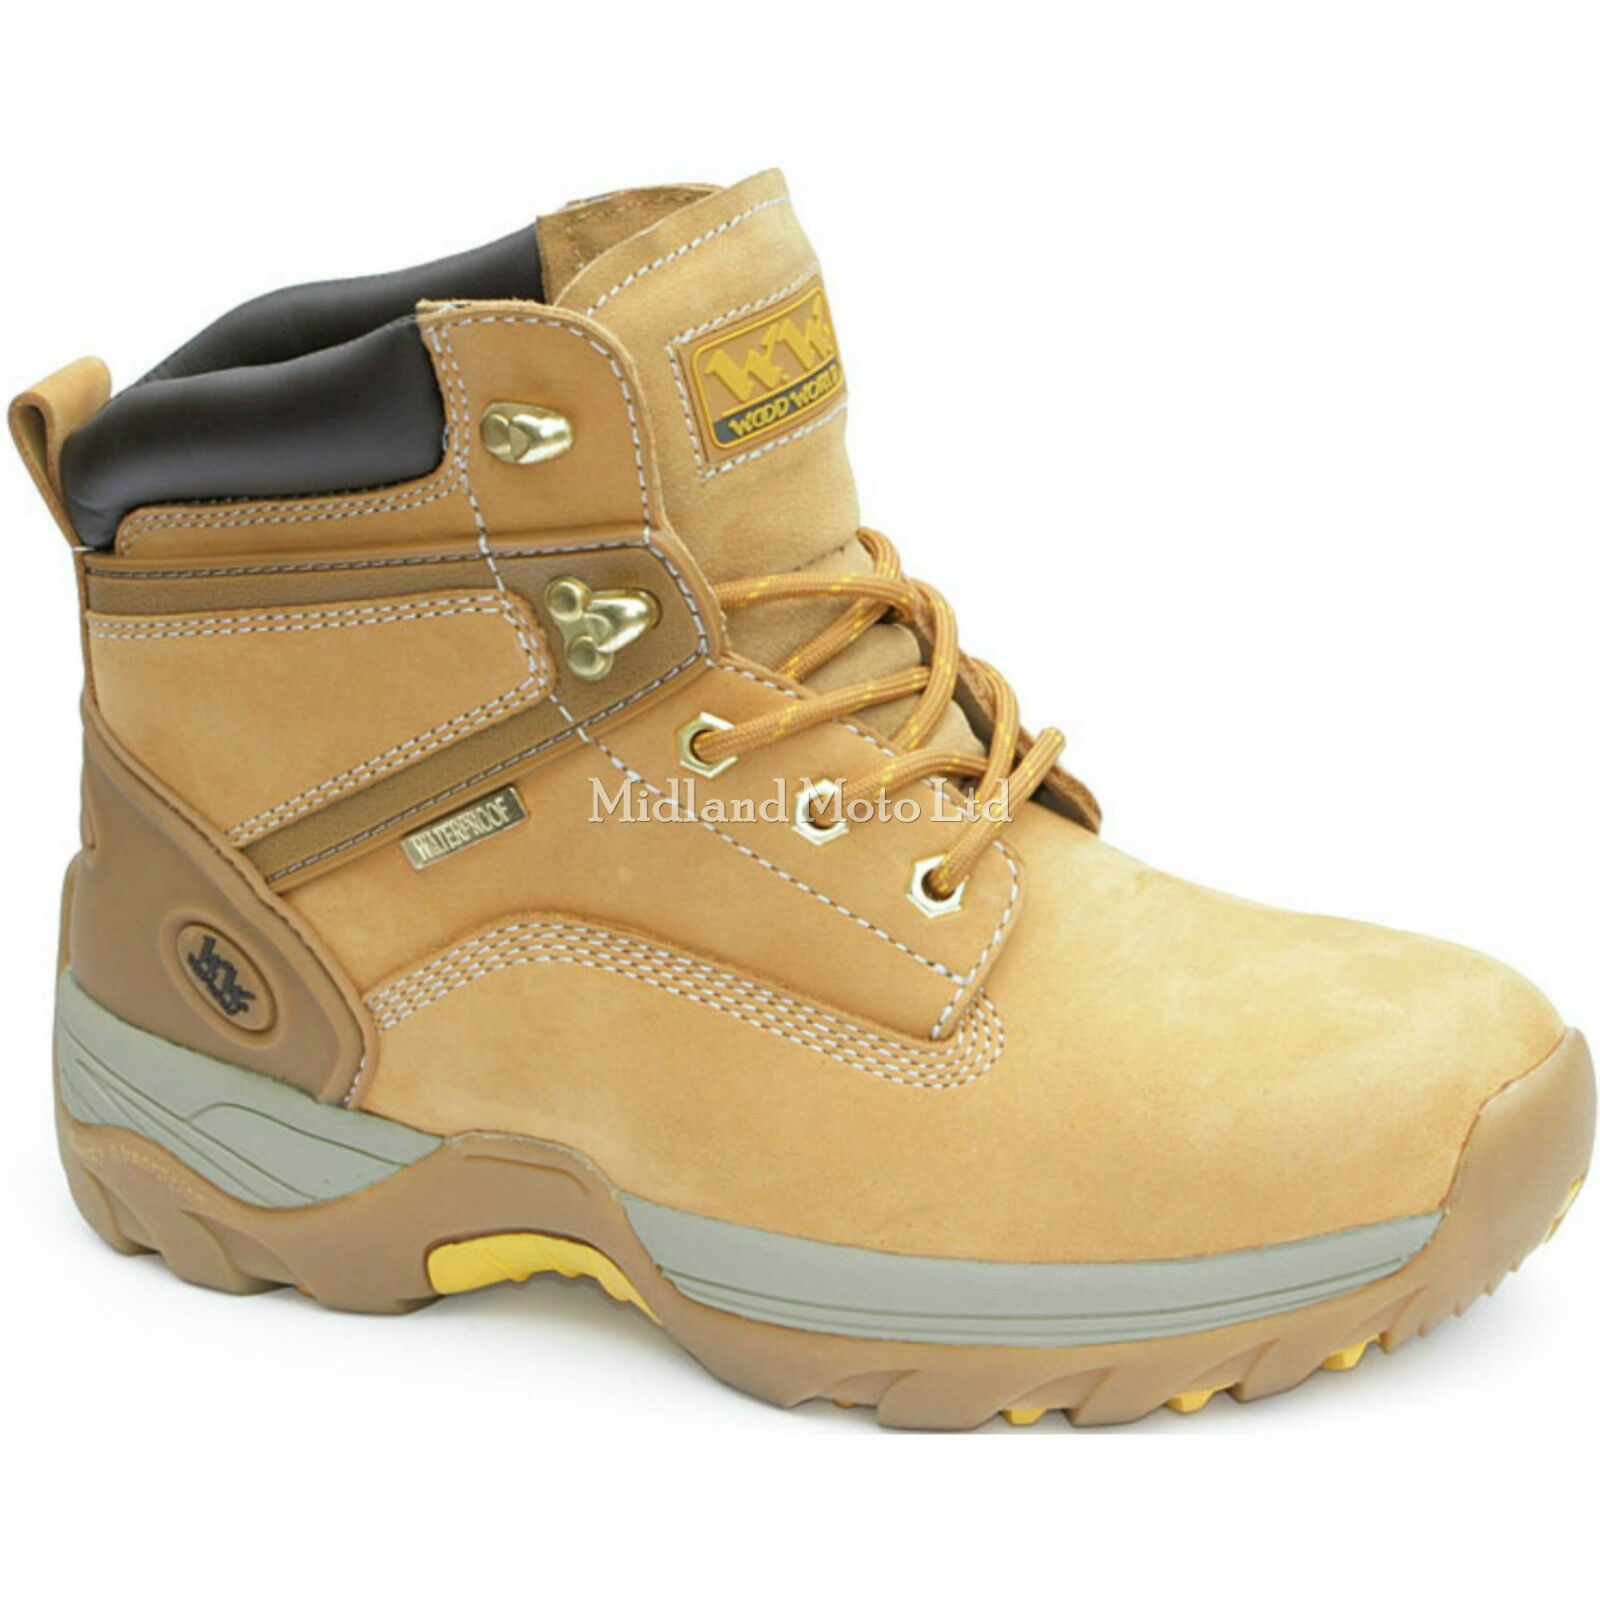 Wood World Steel Toe Cap, Waterproof Honey Nubuck Boots, WW11 WW11Hi-P